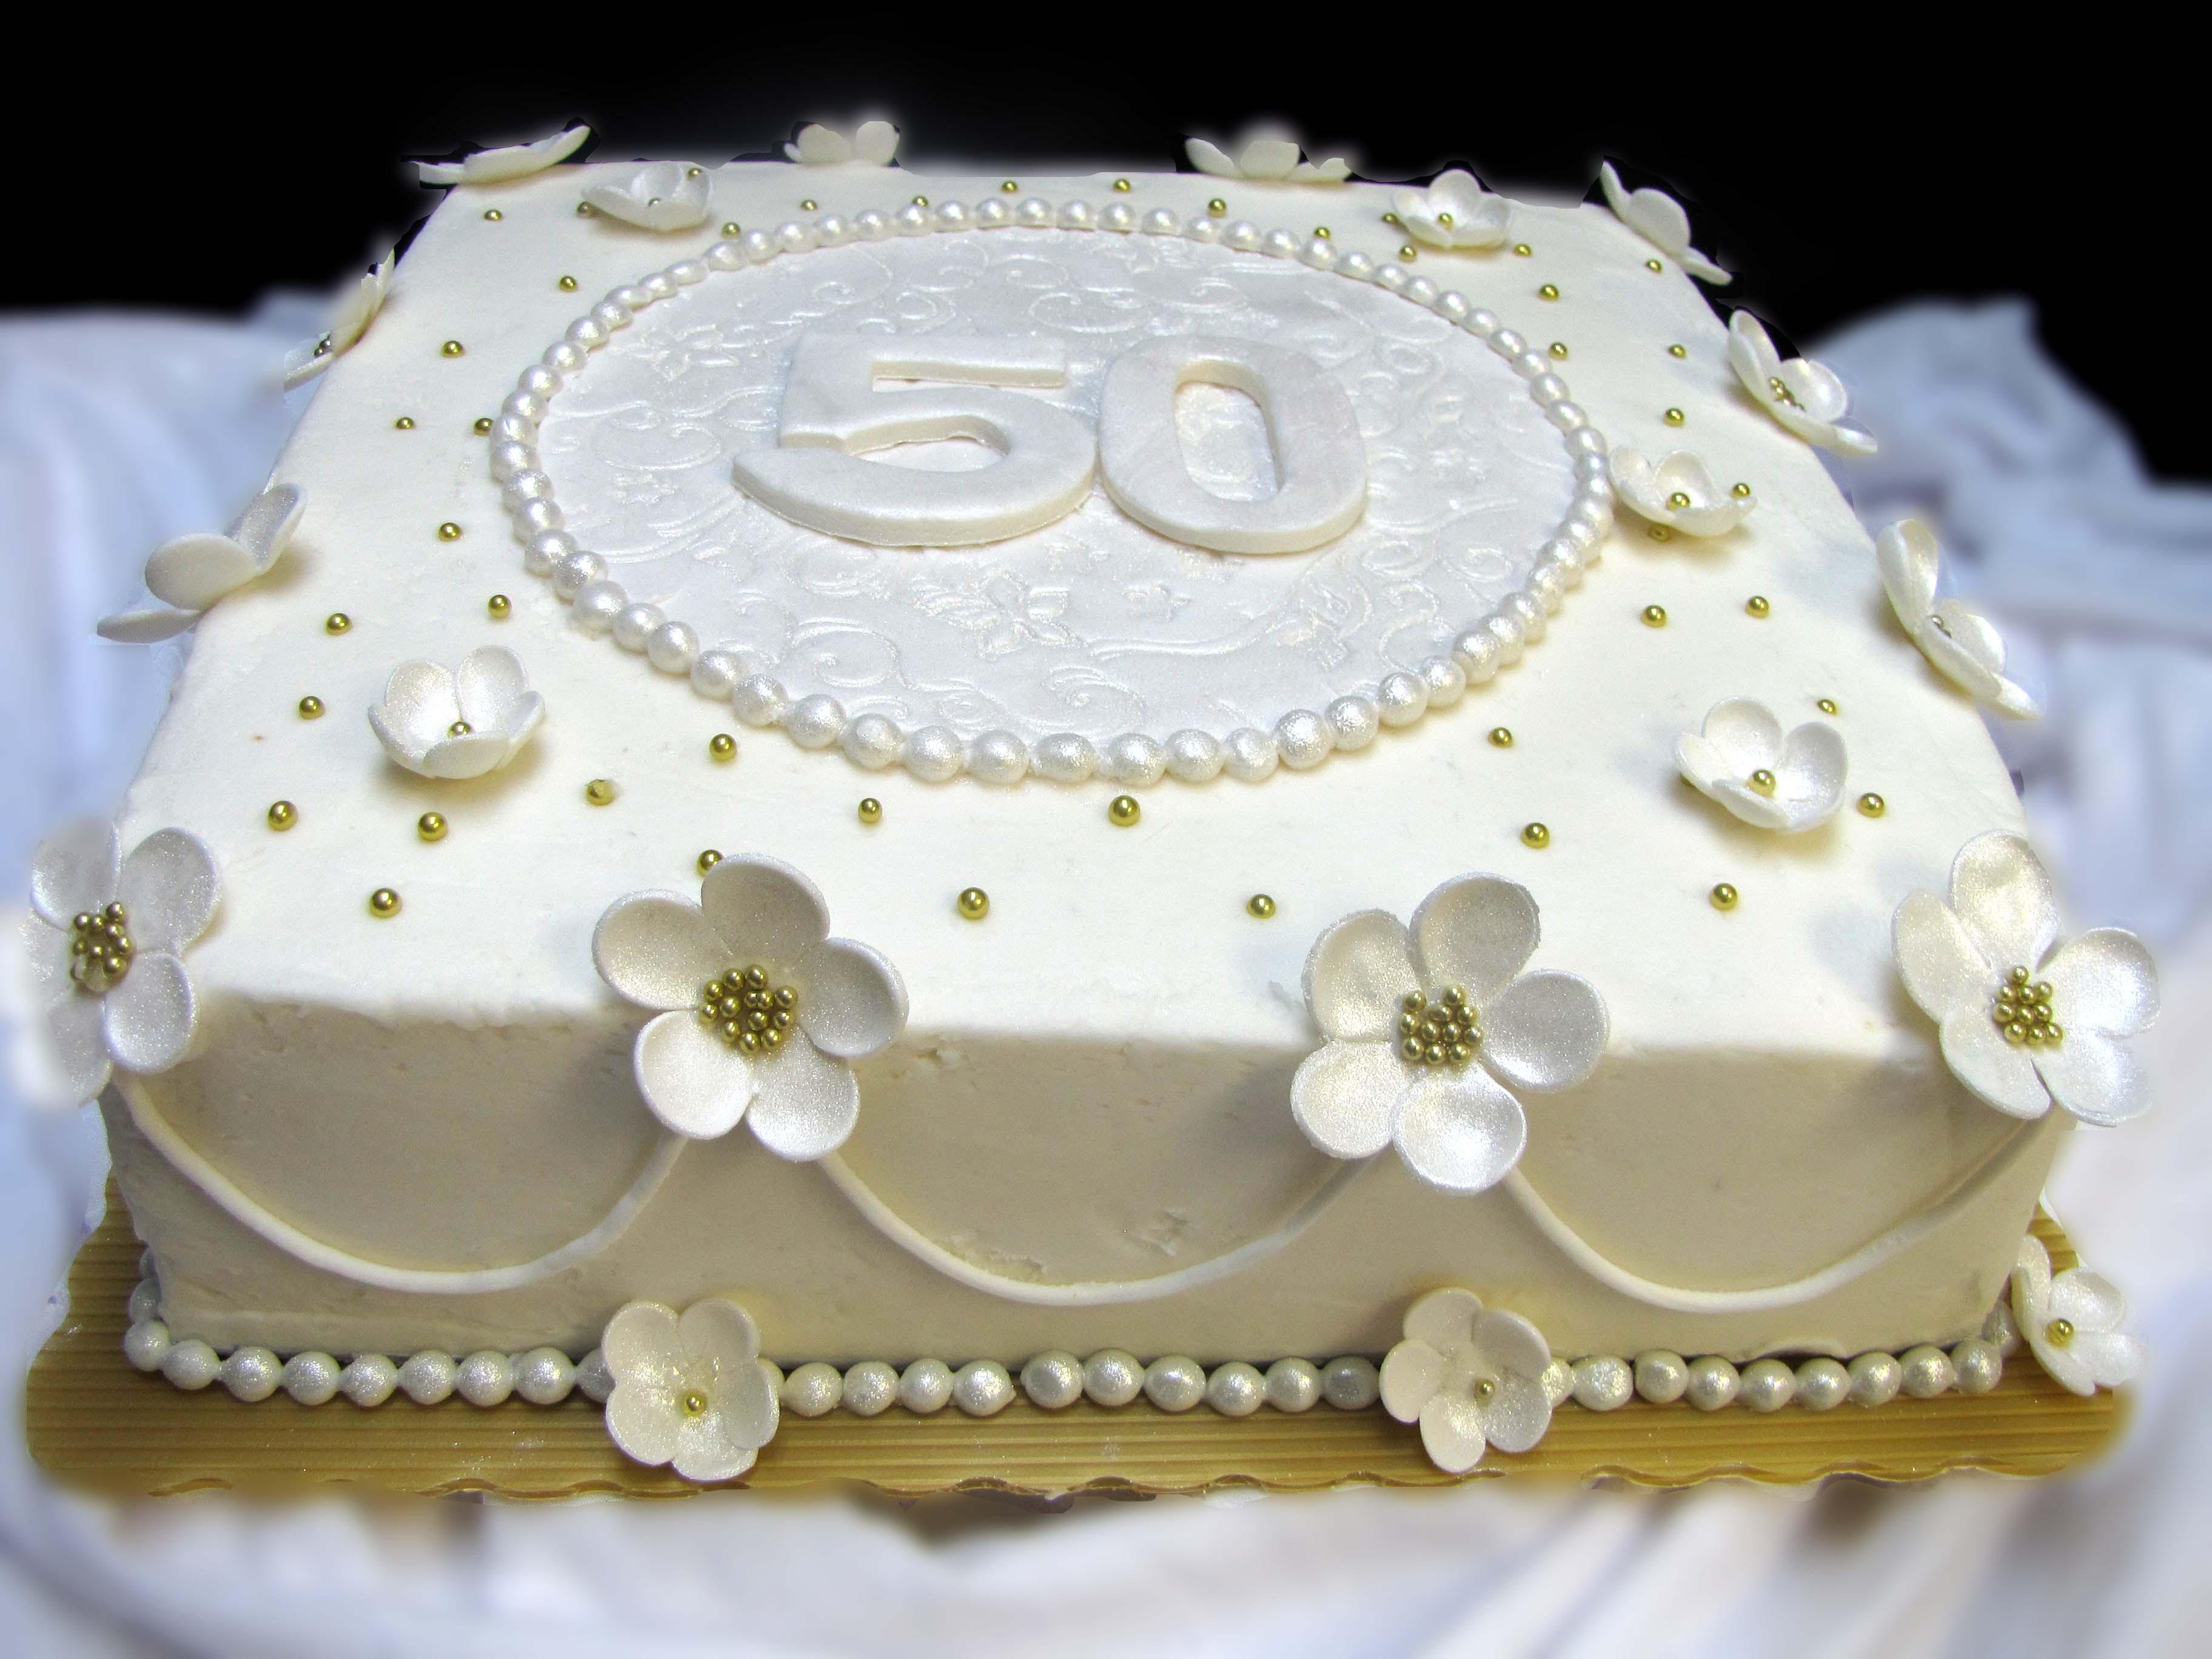 Celebrating 50th Wedding Anniversary